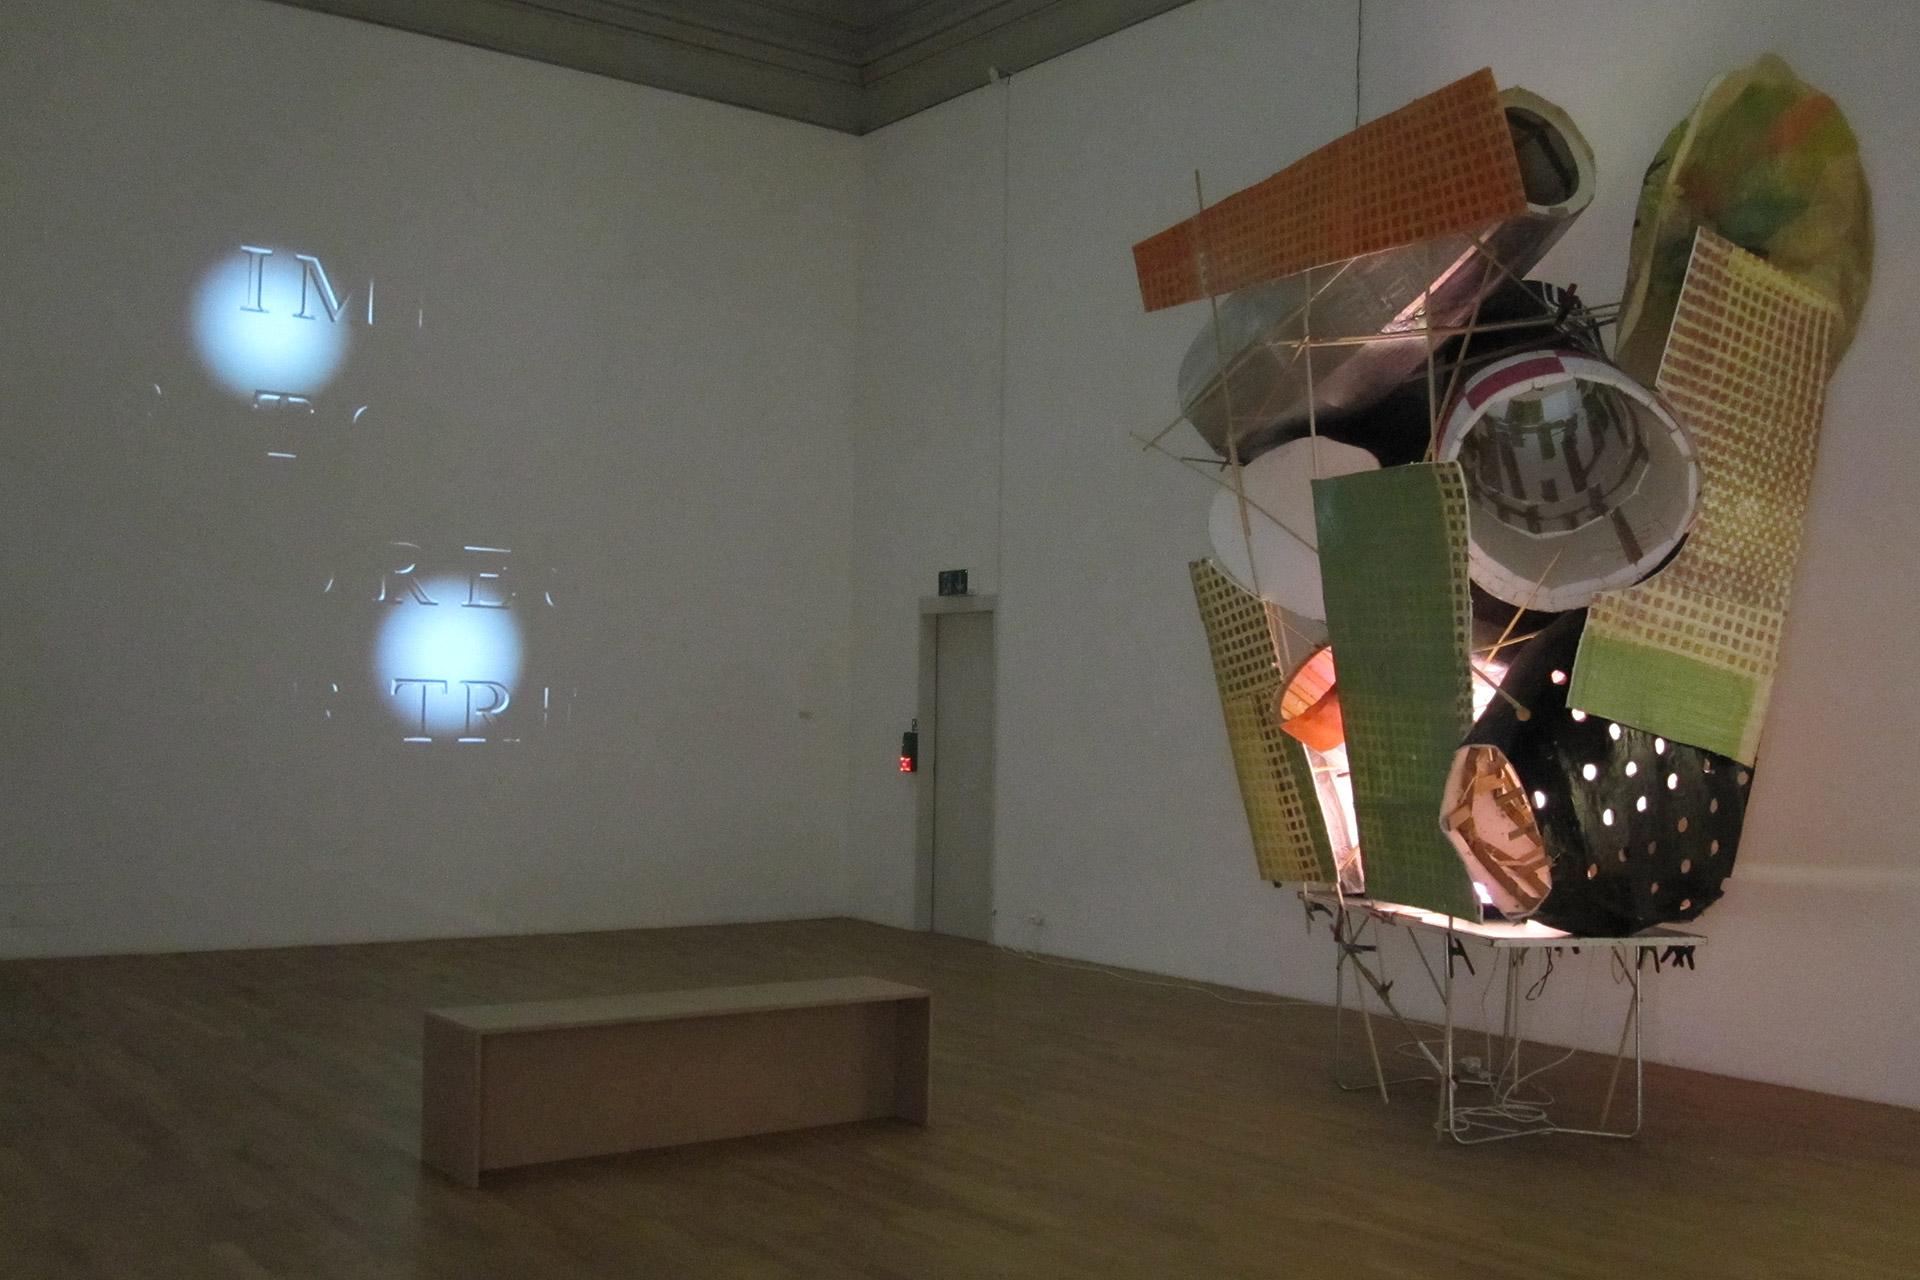 Dezember-Ausstellung-Kunsthalle-Winterthur-2011.jpg